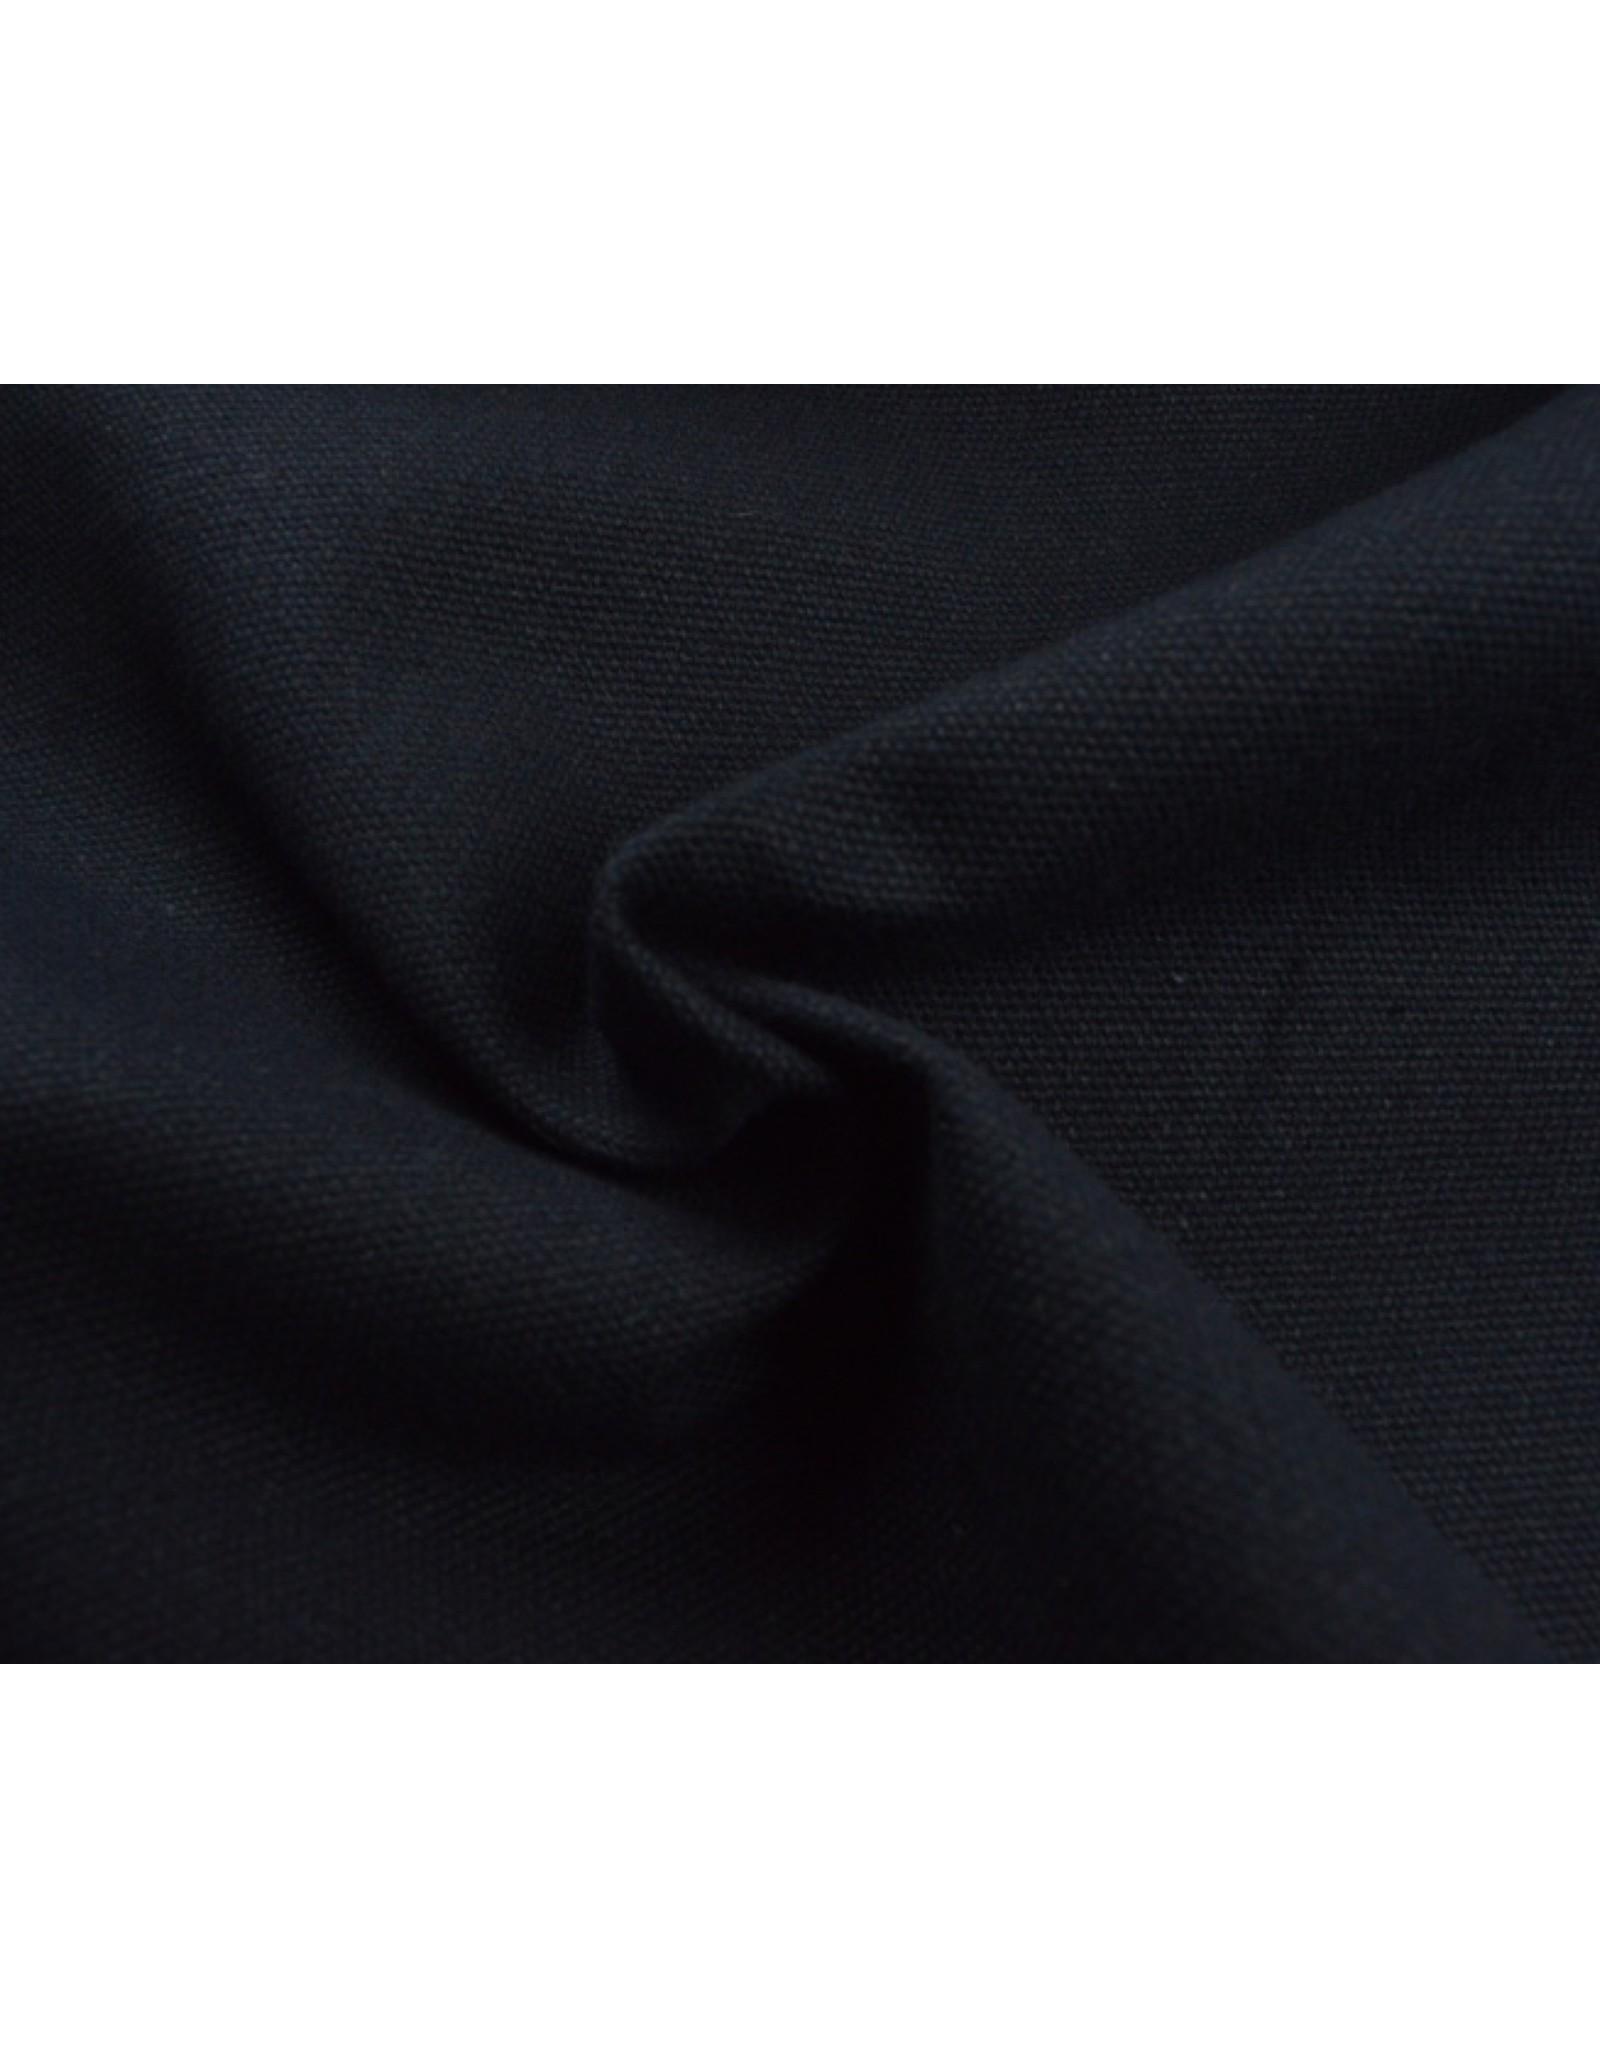 Canvas stof Uni - Navy (350 gr/m)